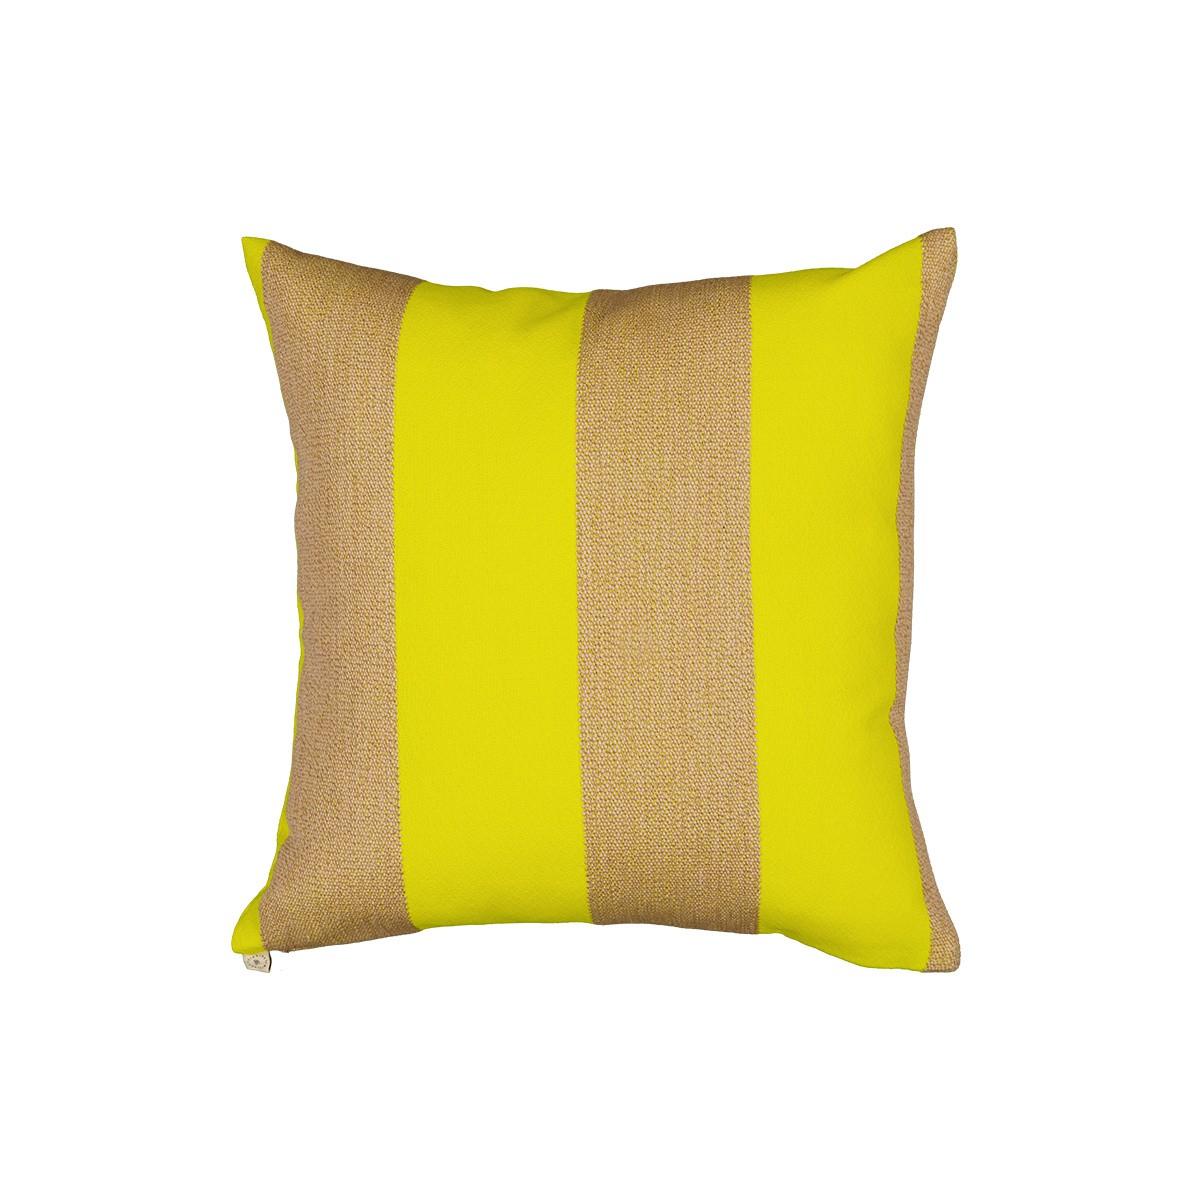 Coussin Viaggio Kvadrat / Raf Simons jaune